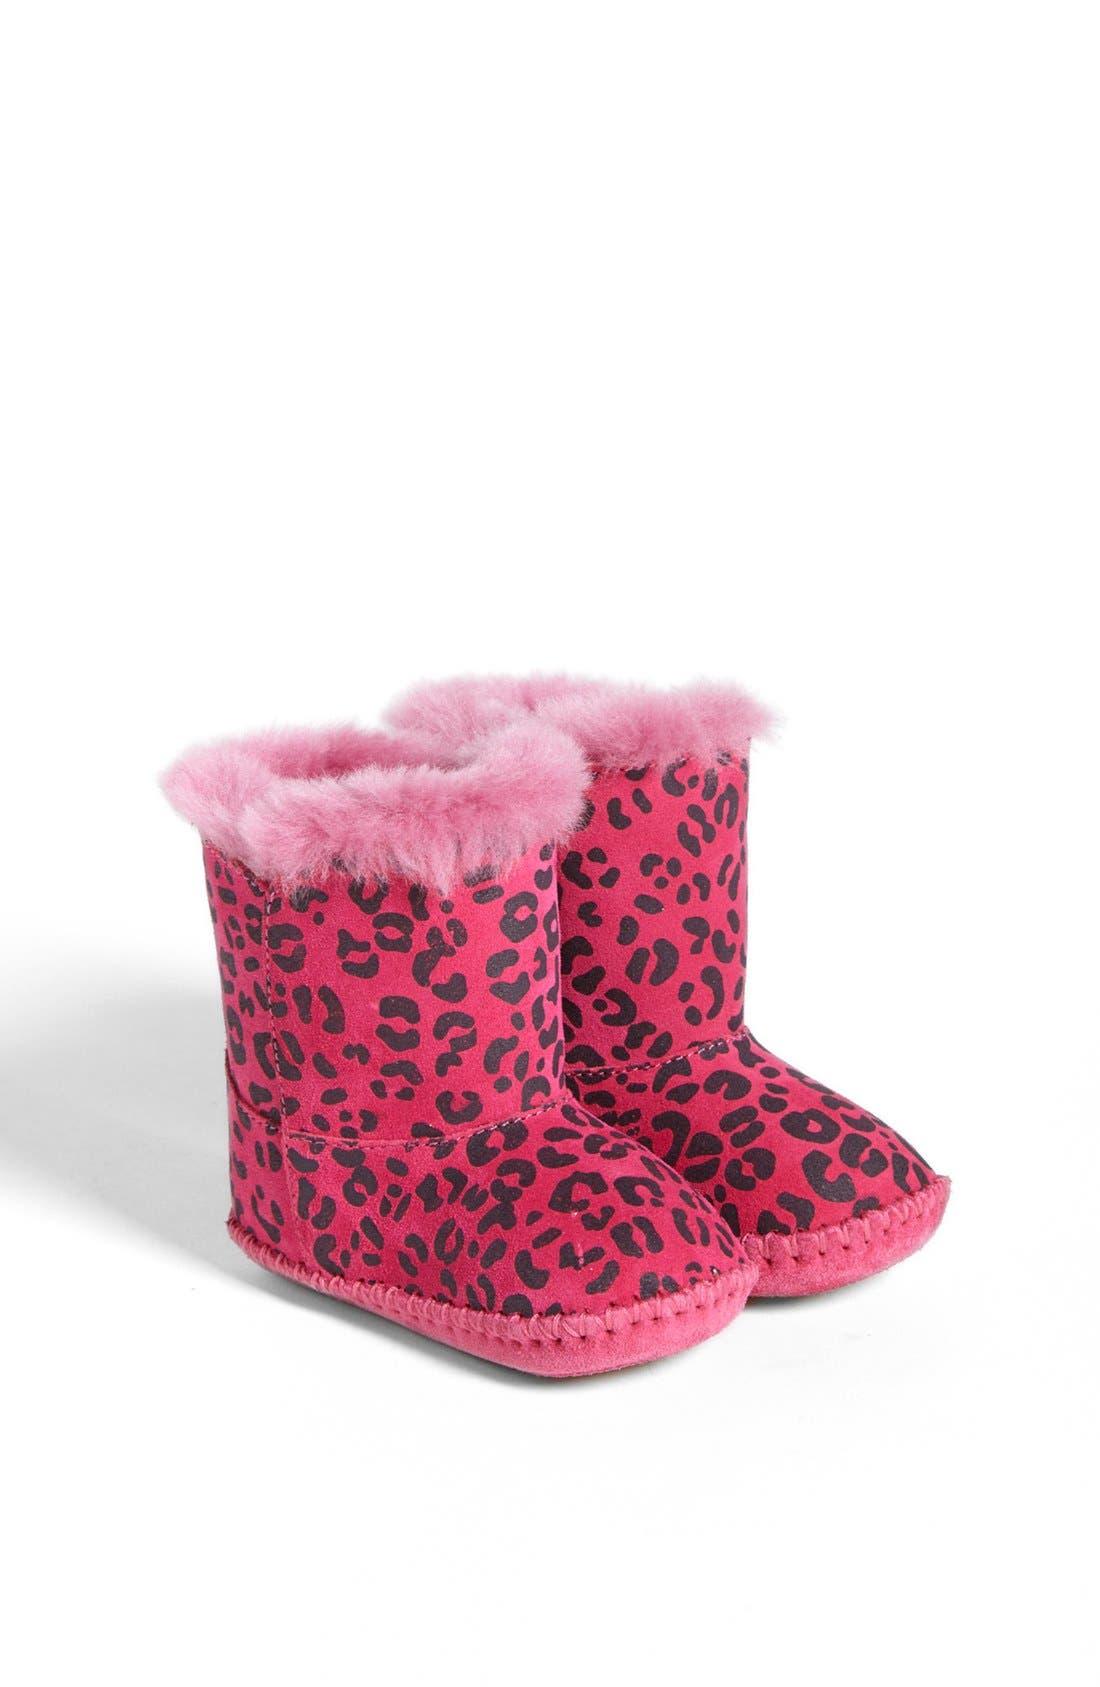 Alternate Image 1 Selected - UGG® Australia 'Cassie' Leopard Print Boot (Baby & Walker)(Nordstrom Exclusive)